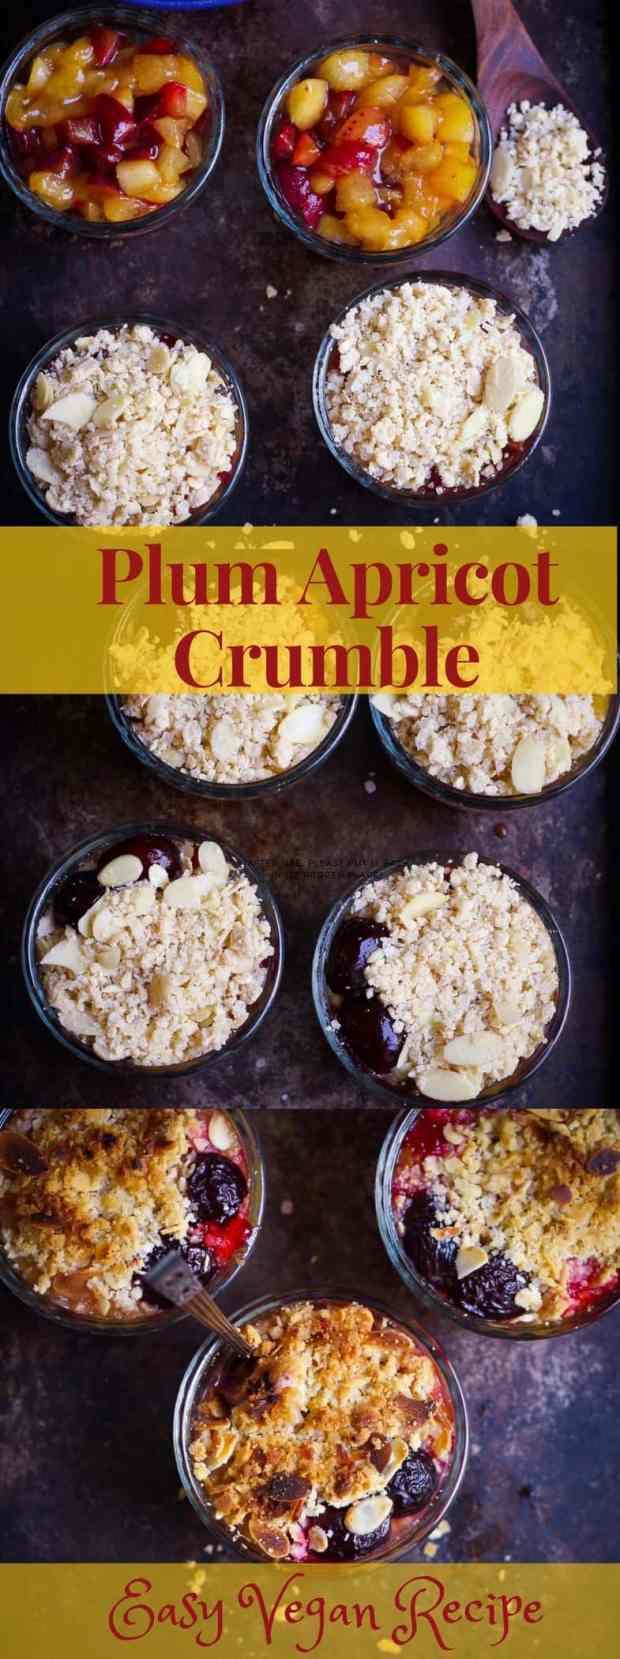 Plum Apricot Crumble vegan easy summer baking